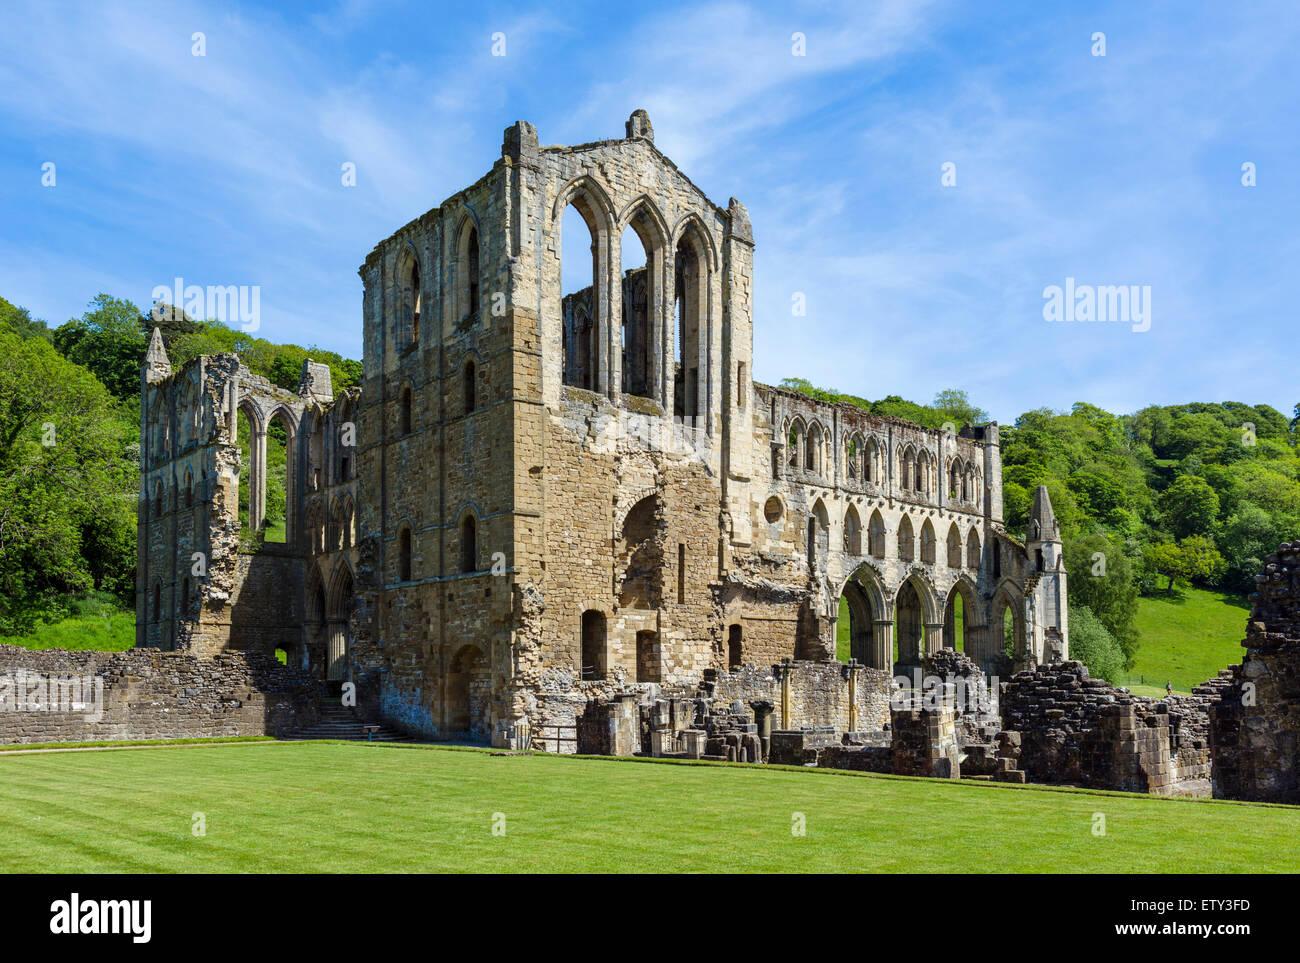 Ruins of Rievaulx Abbey, near Helmsley, North Yorkshire, England, UK - Stock Image